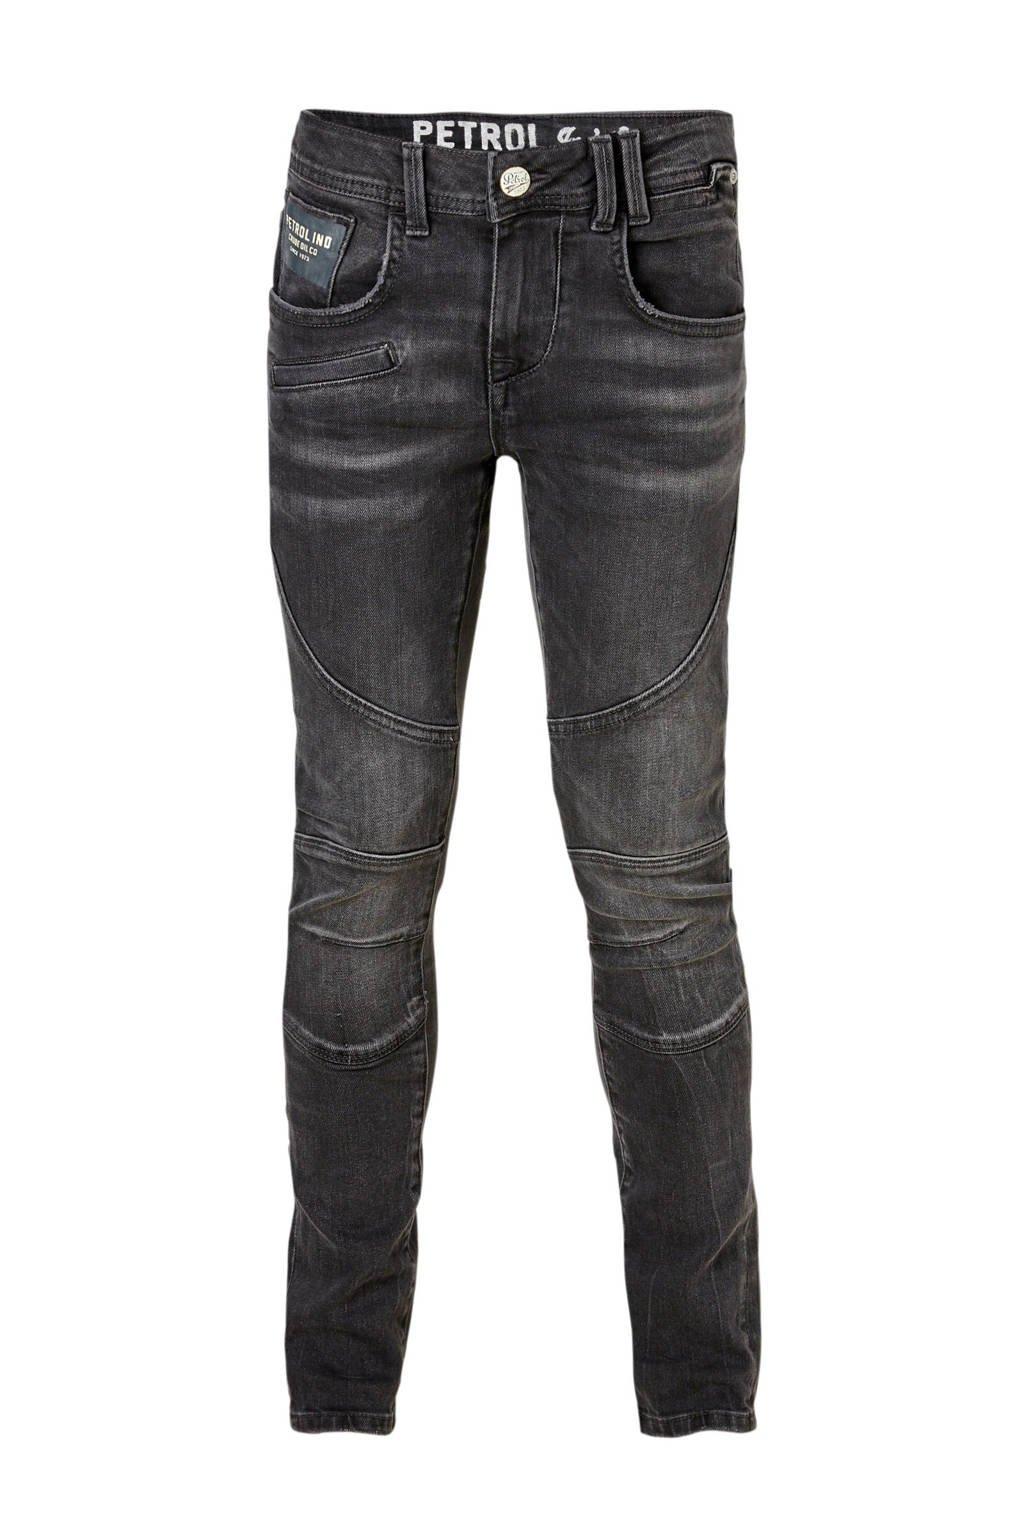 Petrol Industries slim fit jeans grijs, Grijs